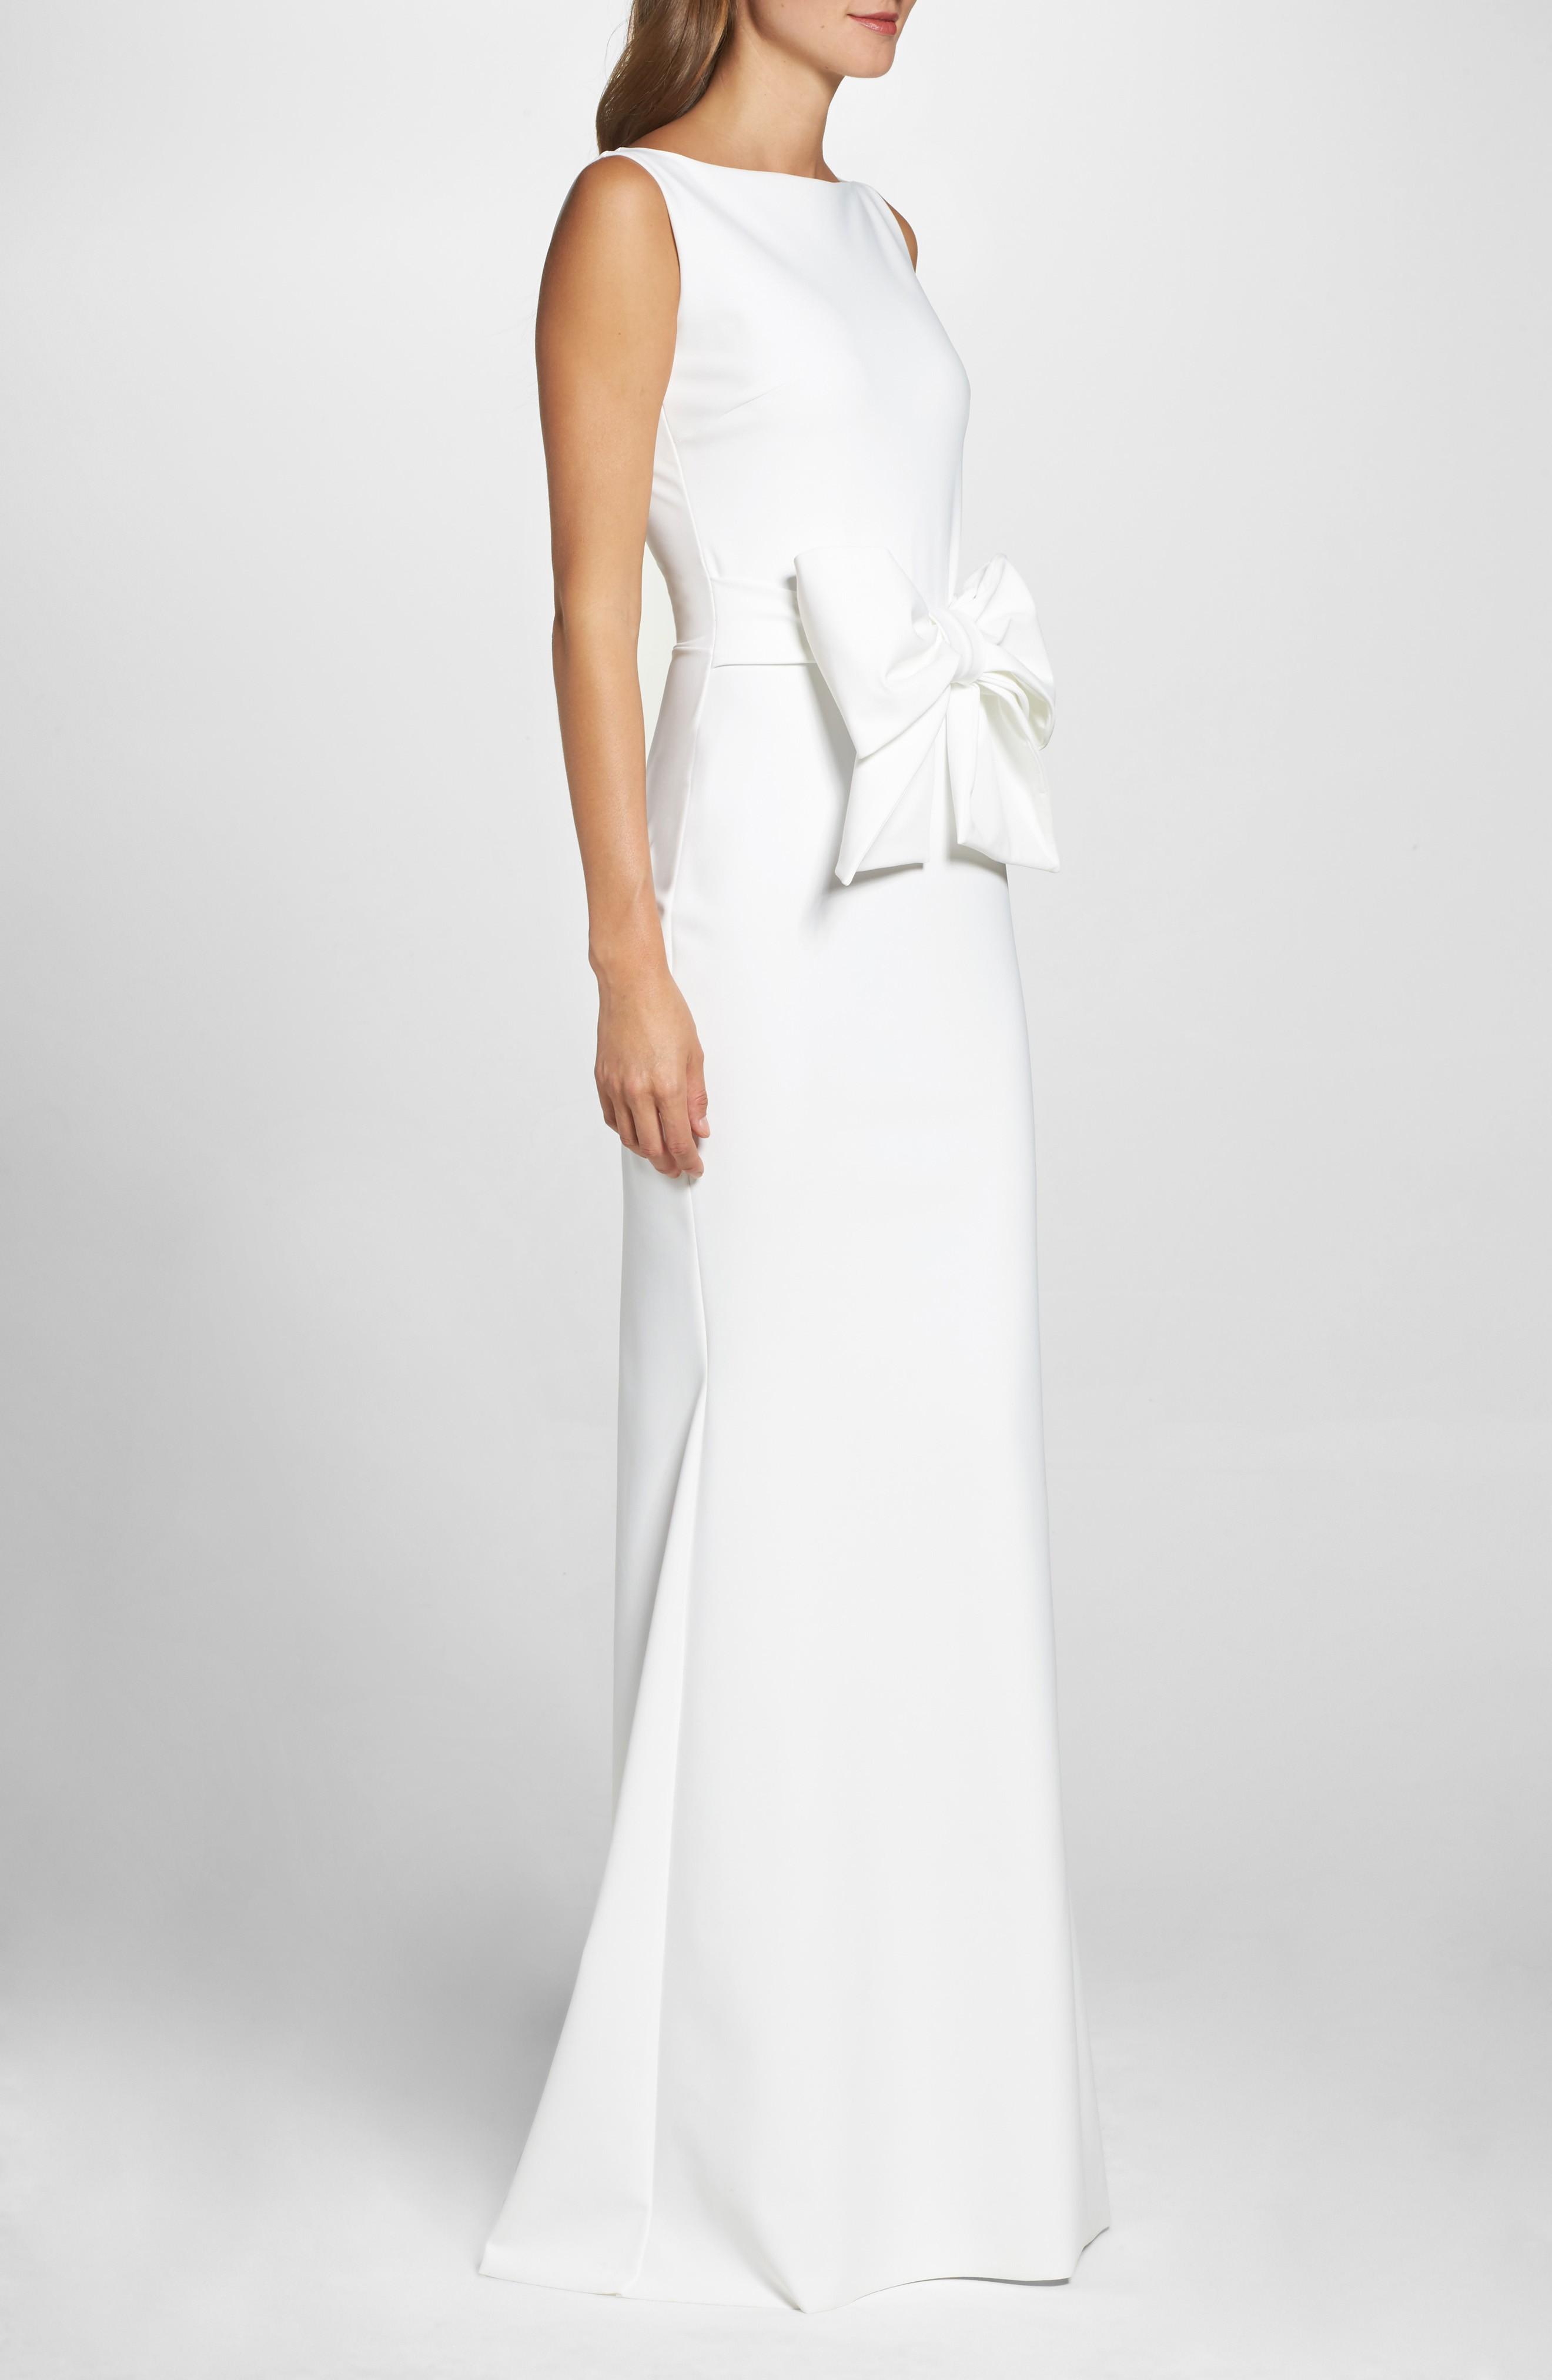 chiara boni la petite robe bow detail sleeveless white gown we select dresses. Black Bedroom Furniture Sets. Home Design Ideas